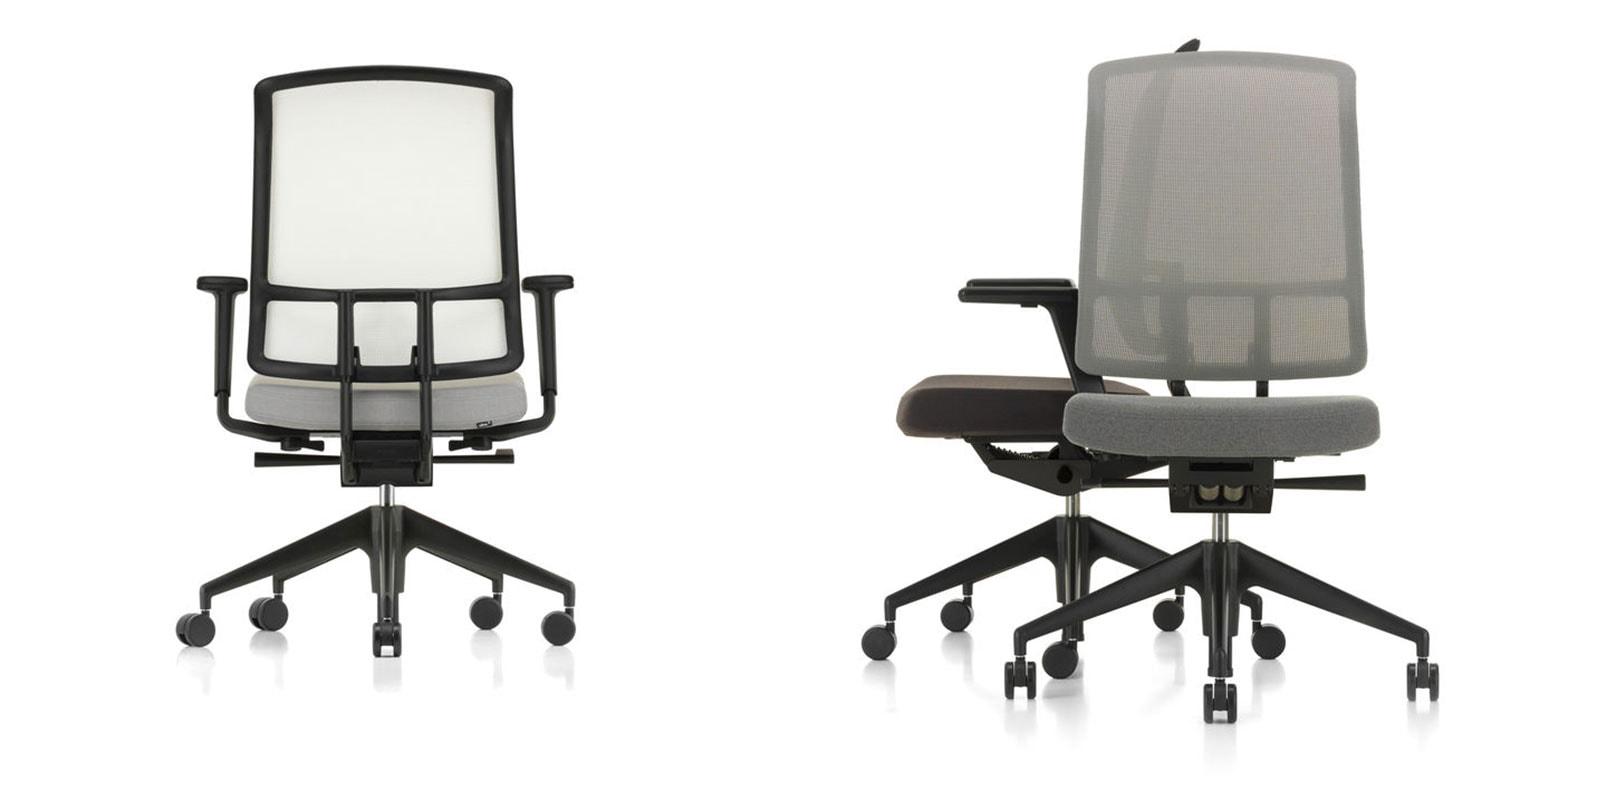 AM Chair poltrona operativa